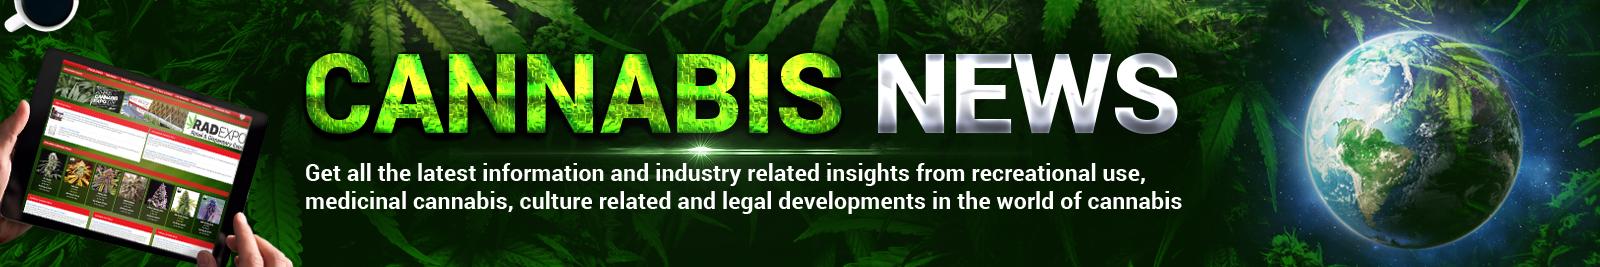 Daily Cannabis News